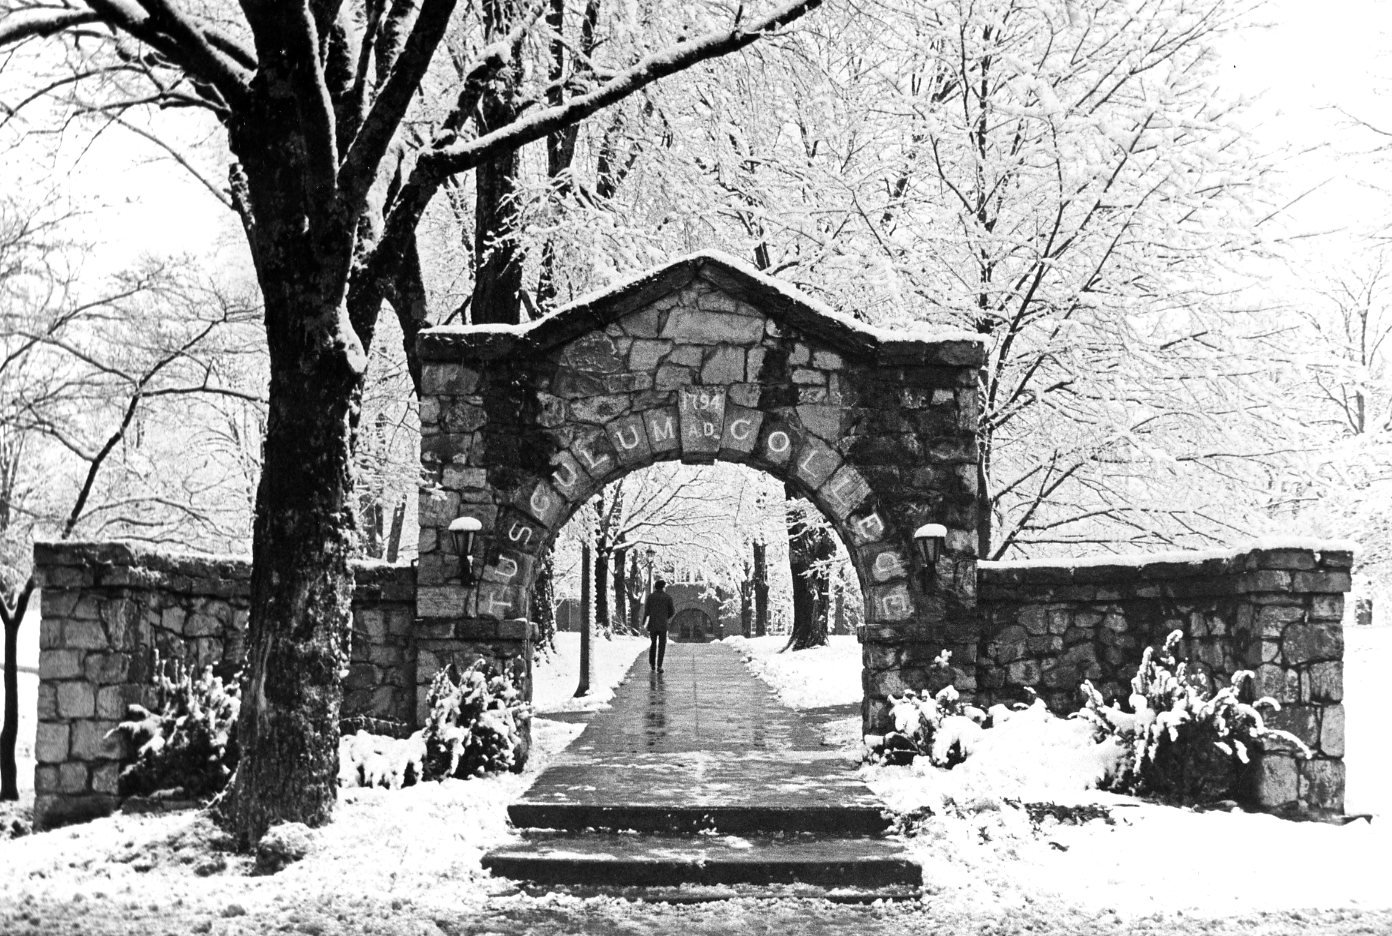 The arch under snowfall.